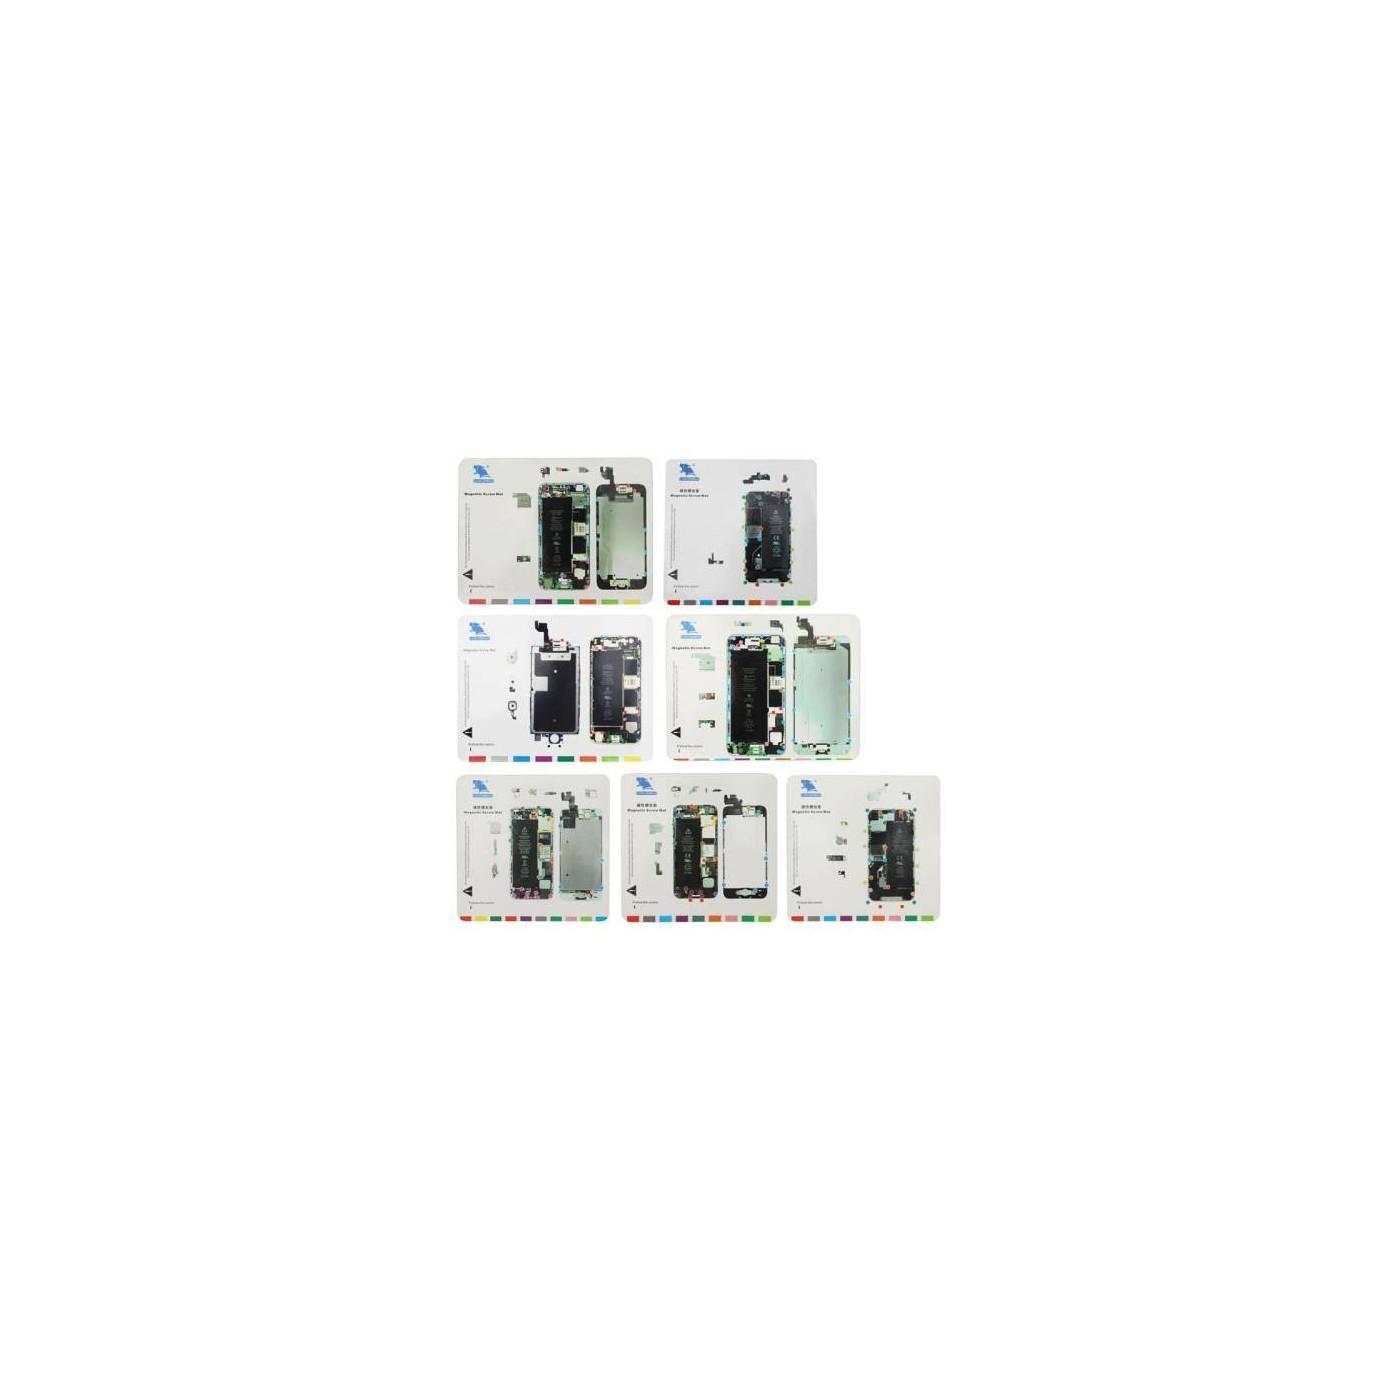 7 in 1 tappeti magnetici per riparazione Iphone 4 4S 5 5S 6 6Plus 6S tappetini